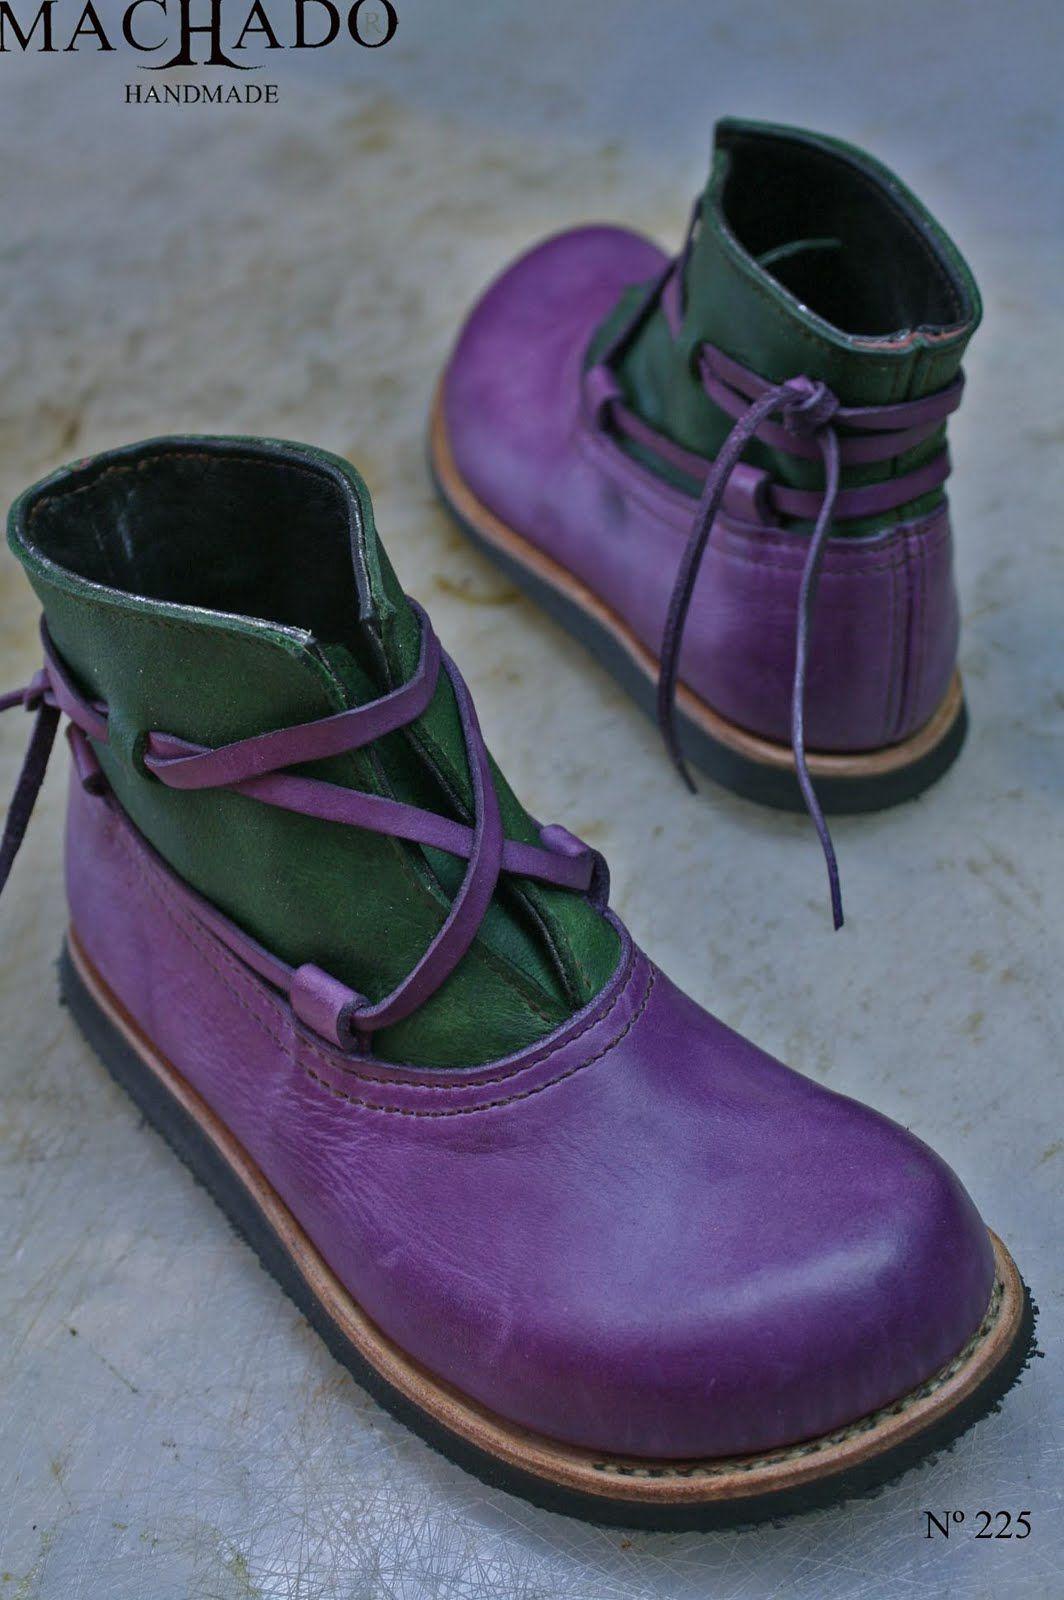 Machado N 225 20 12 2009 Jpg Image Leder Babyschuhe Adidas Schuhe Frauen Schuhe